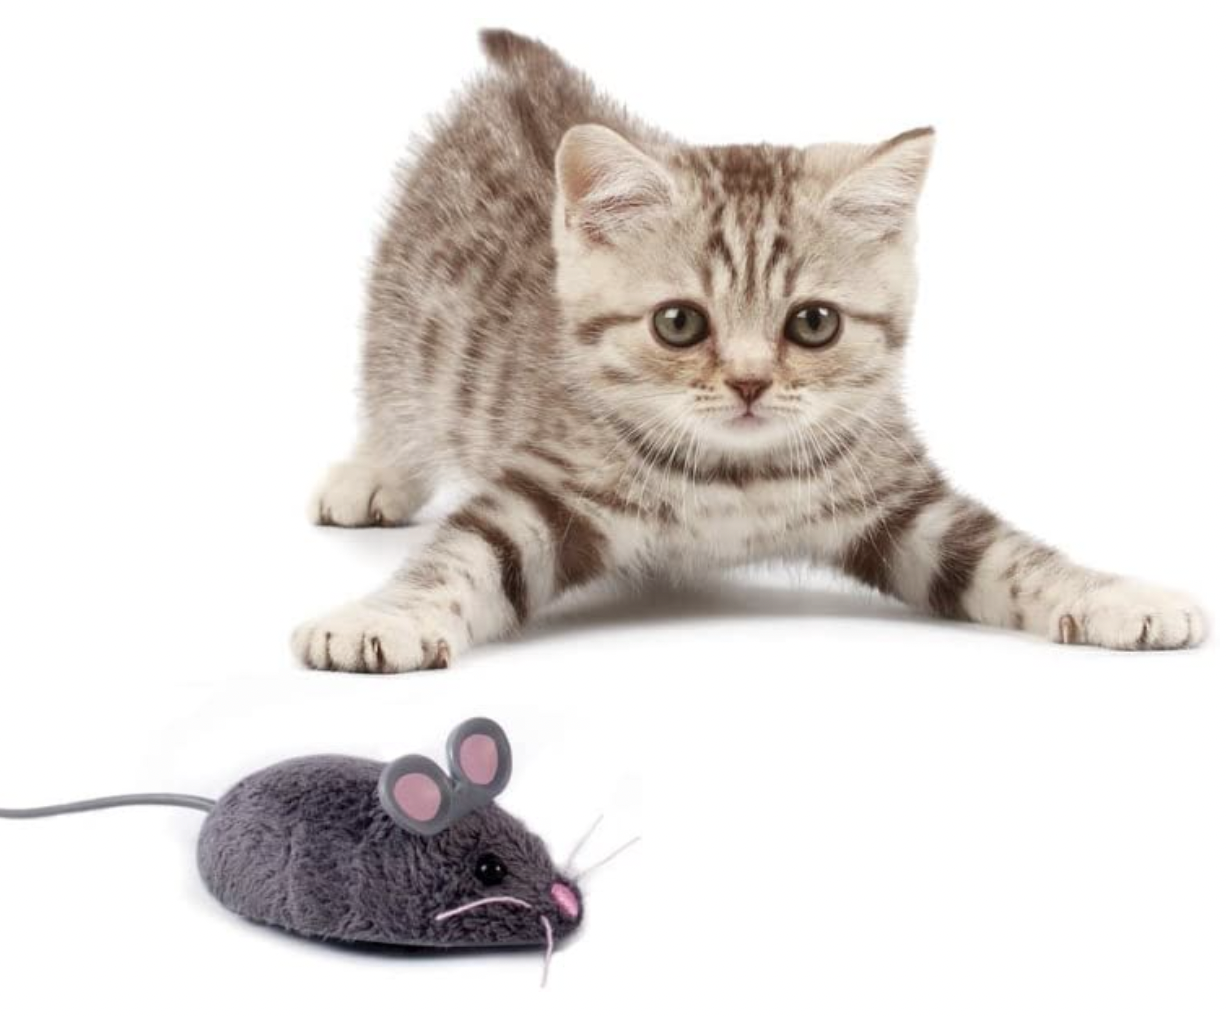 Hexbug Robotic Mouse Cat Toy